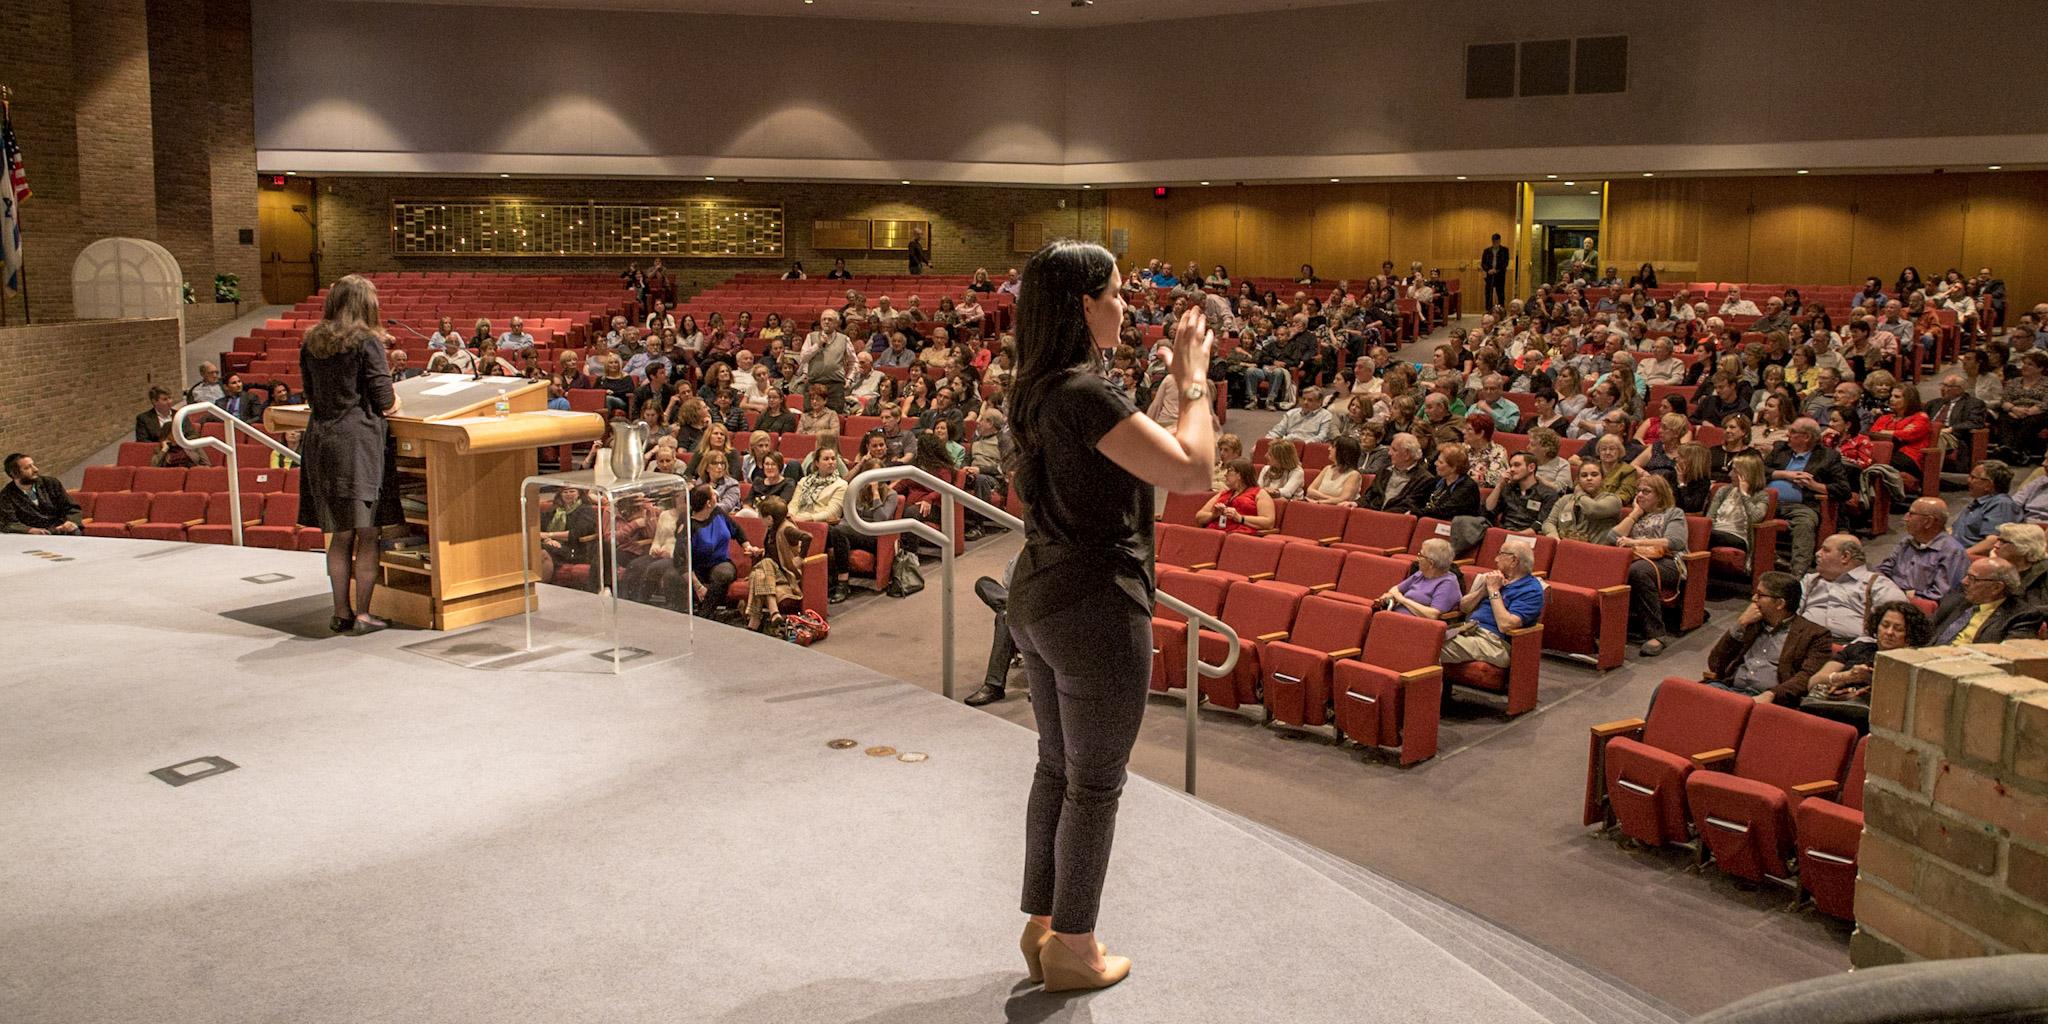 Sarah Hurwitz at Temple Israel (5/17)  photo by Jamie Feldman